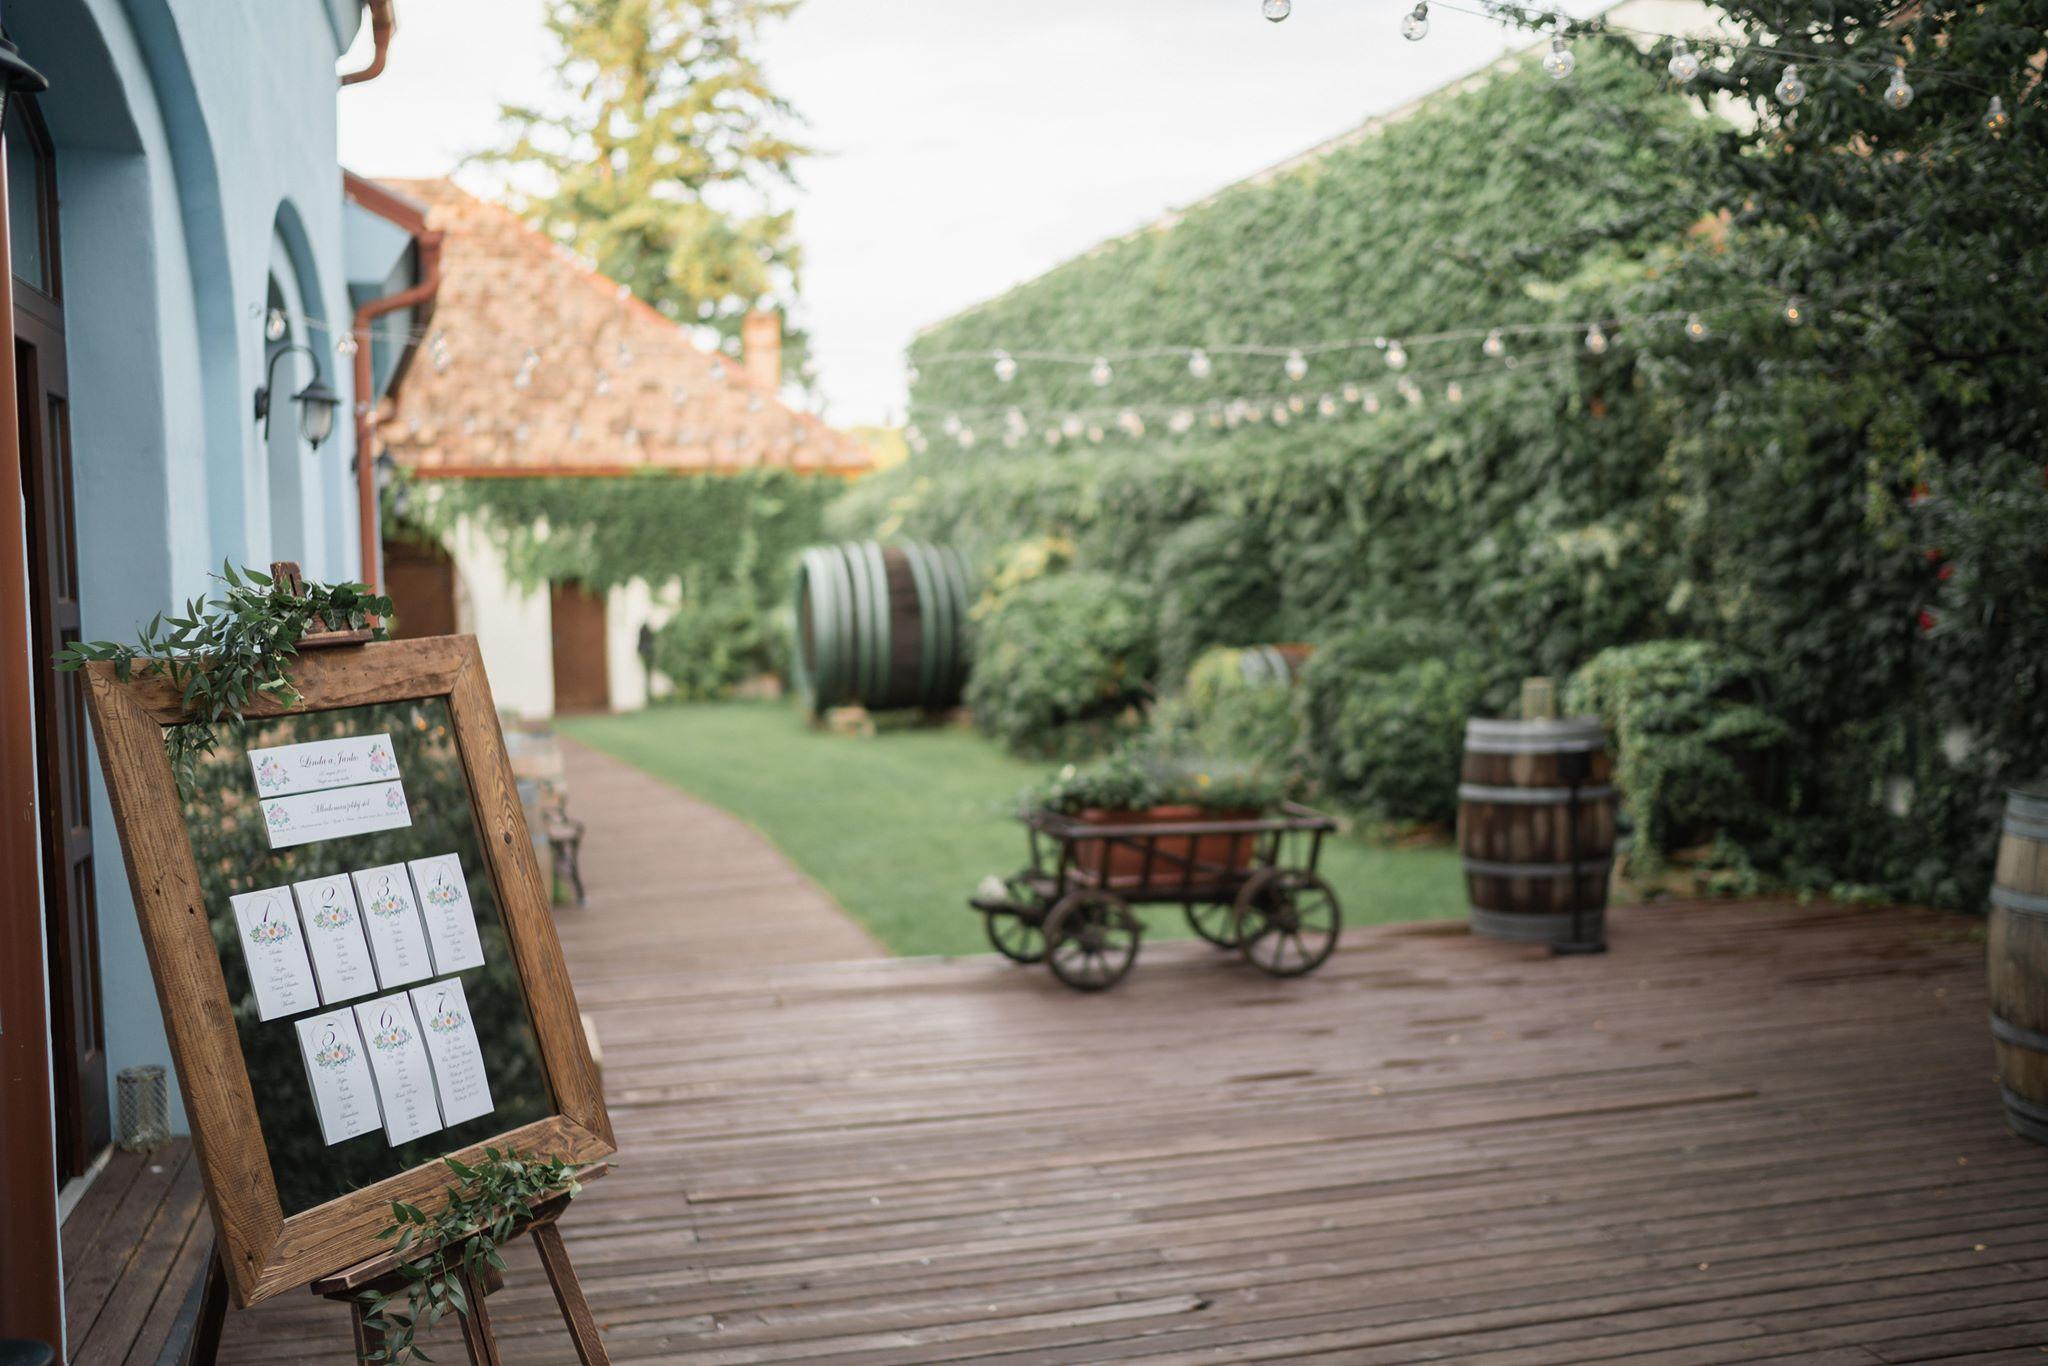 svadba-wedding-boho-slovakia-dj-moderator-starejsi-fotograf-neco-estate-wineryjpg